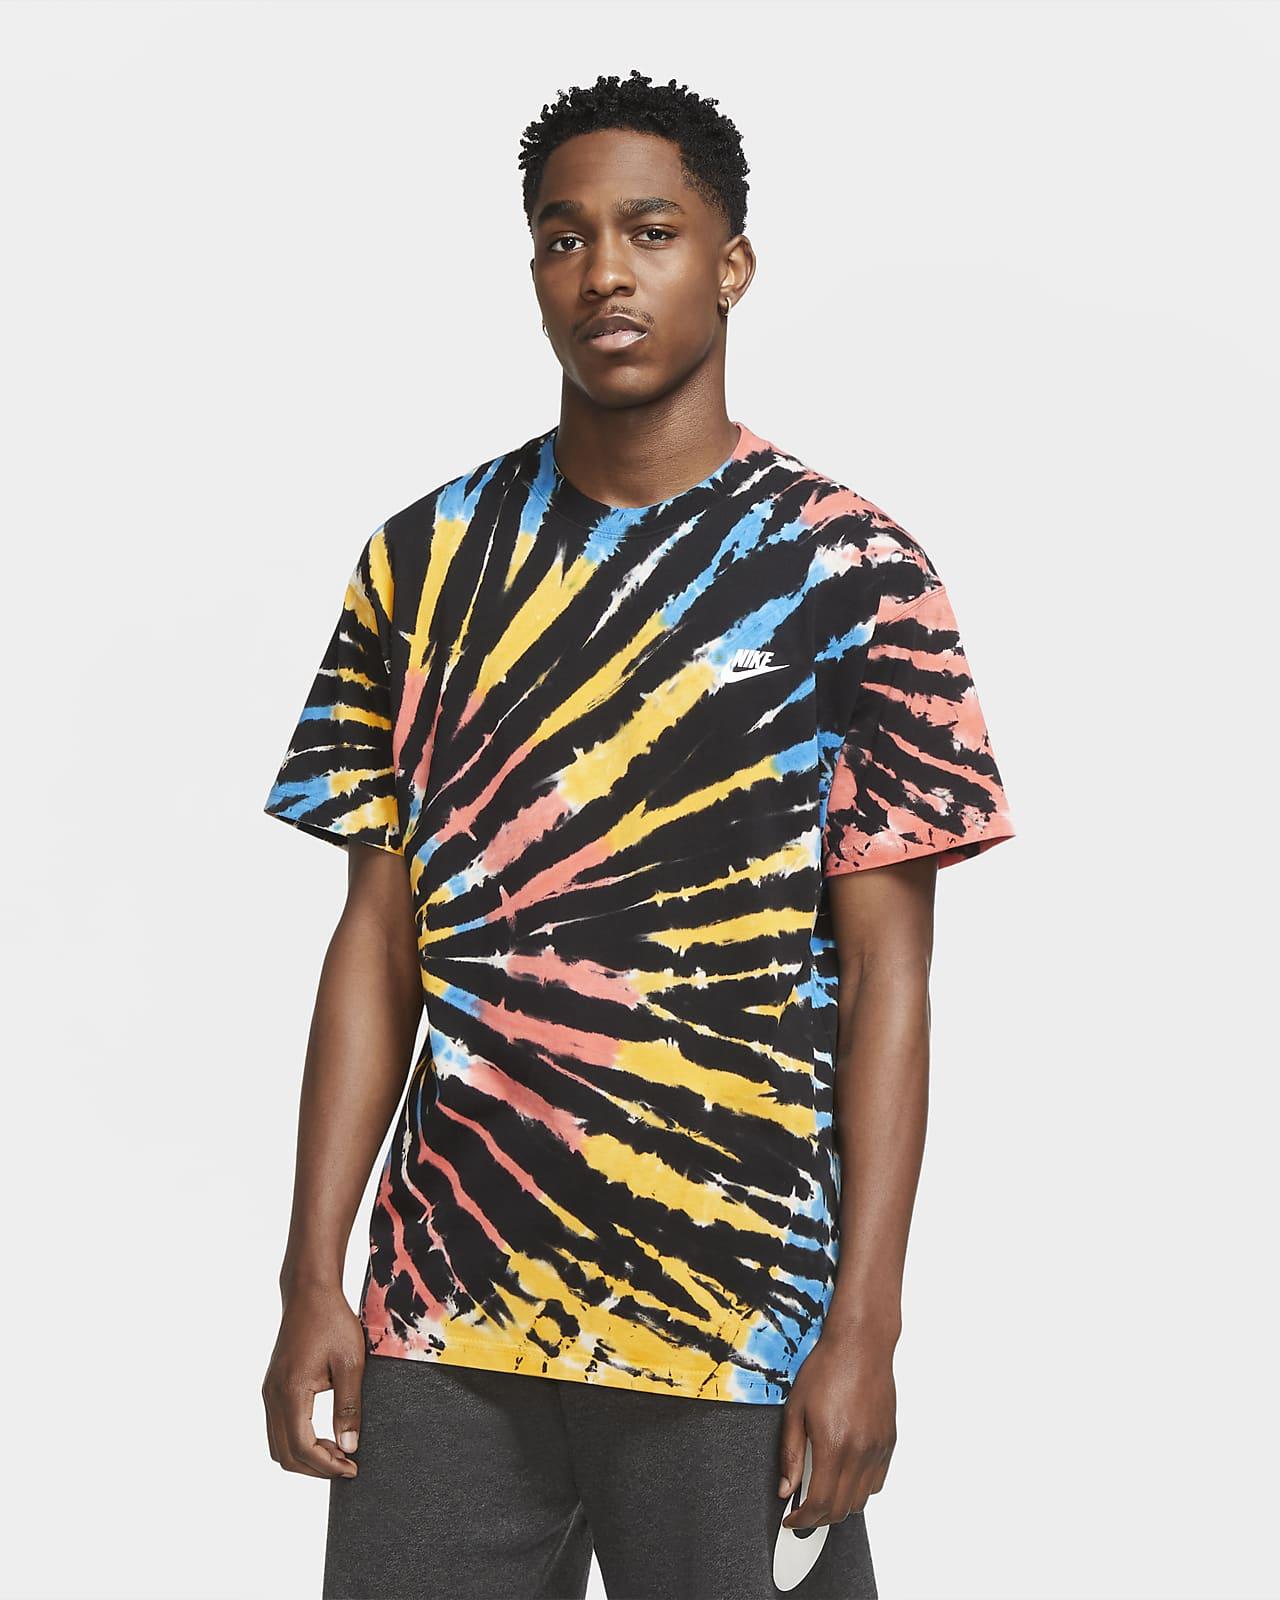 Мужская футболка с принтом тай-дай Nike Sportswear